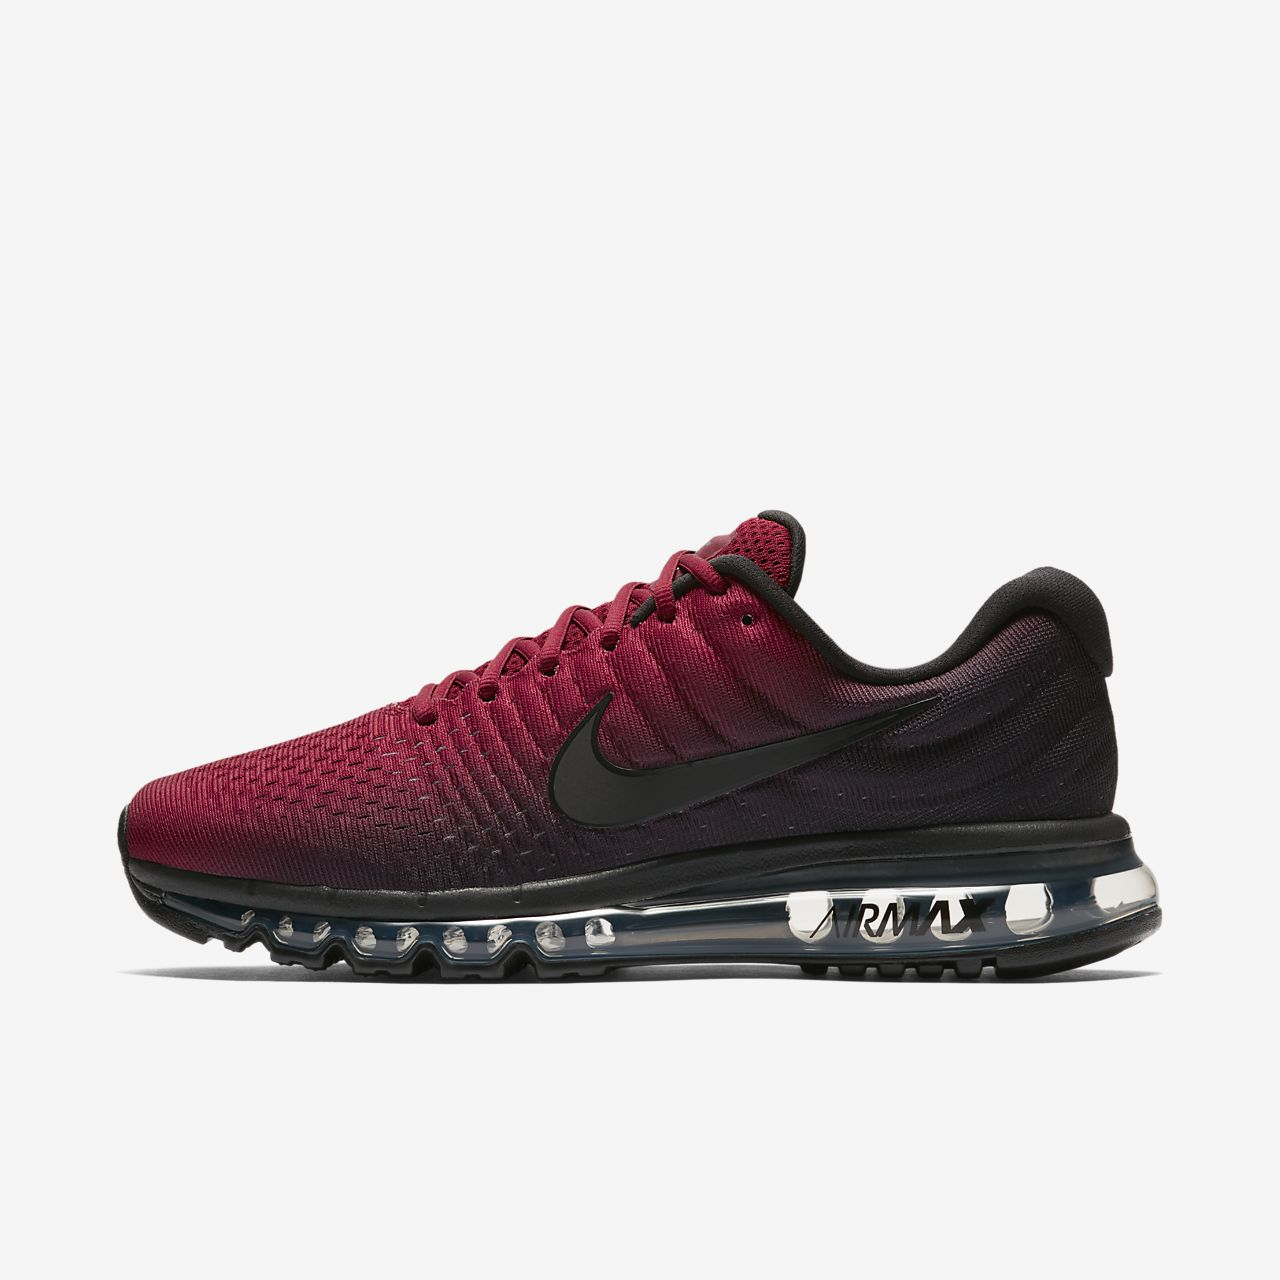 huge discount cf9ca b29f4 ... Nike Air Max 2017 - løbesko til mænd